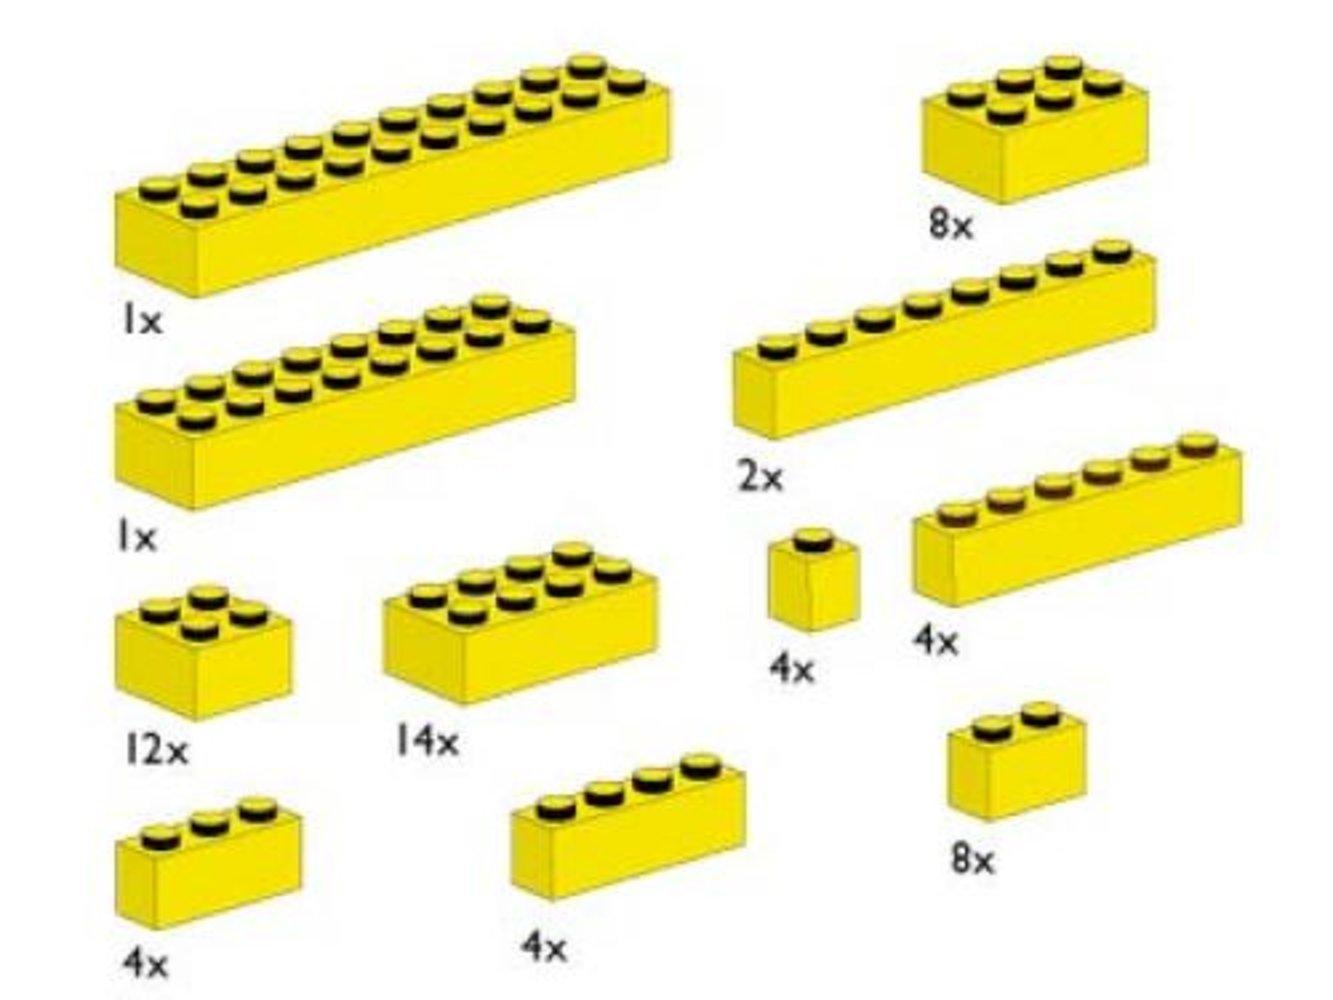 Assorted Yellow Bricks